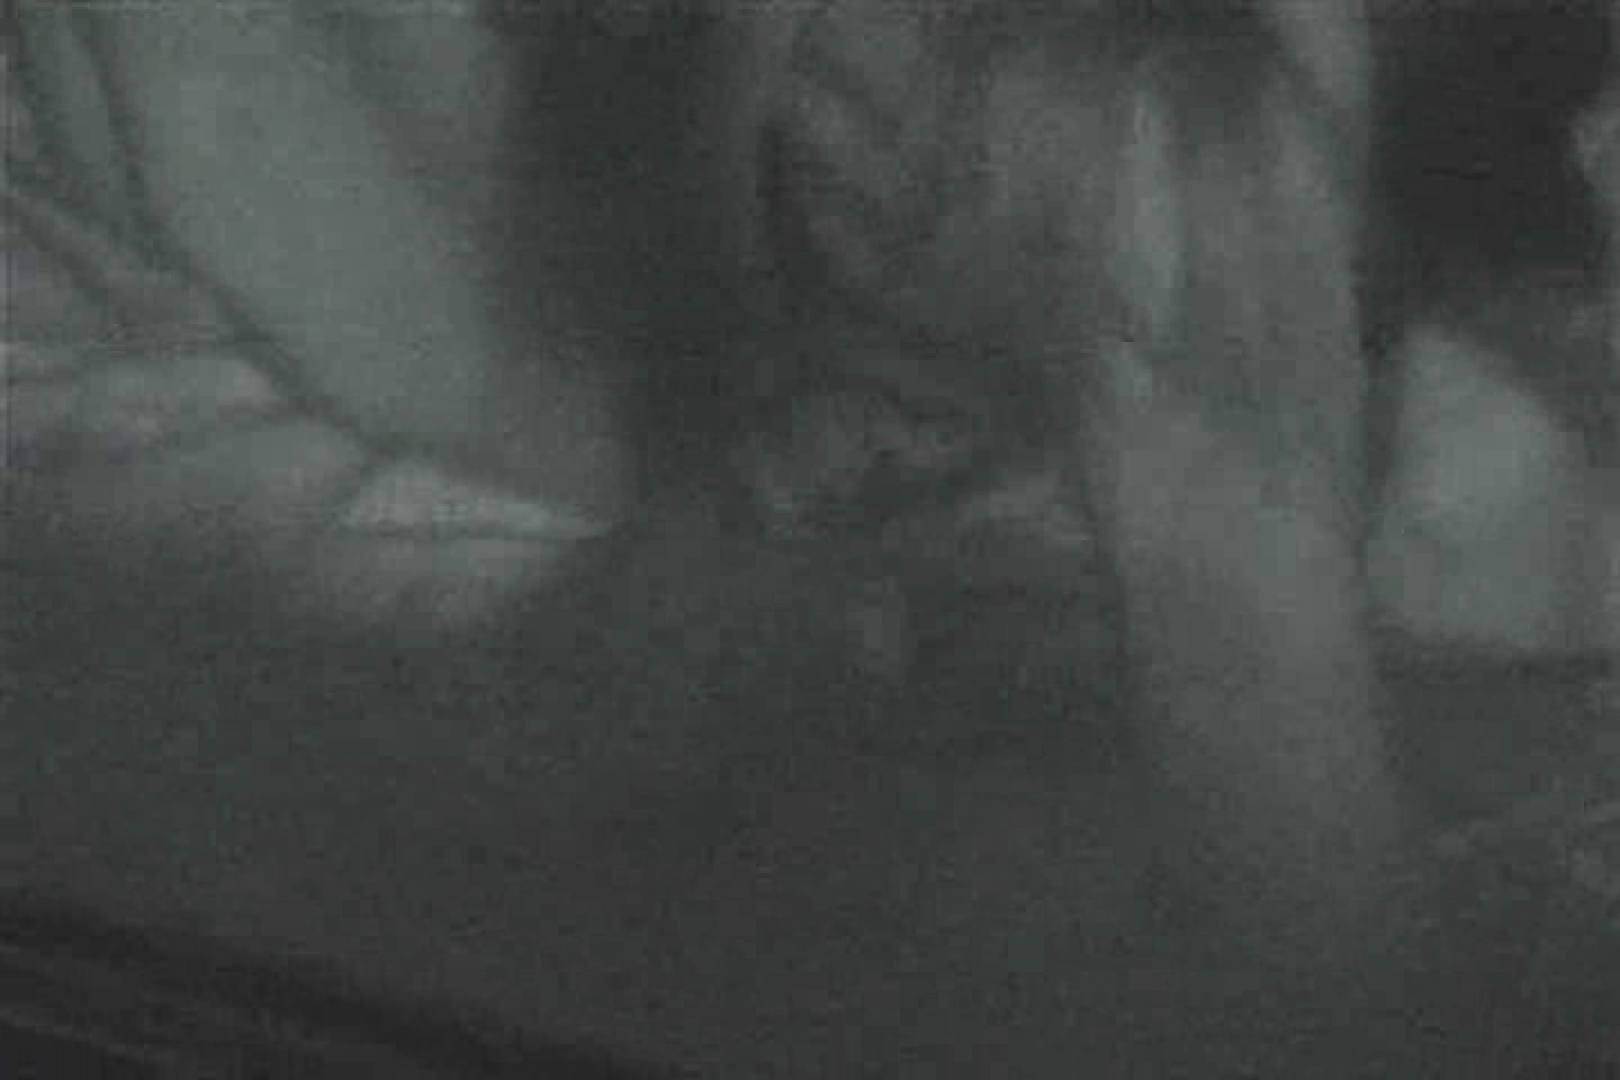 MASAさんの待ち伏せ撮り! 赤外線カーセックスVol.19 セックス エロ無料画像 89画像 57